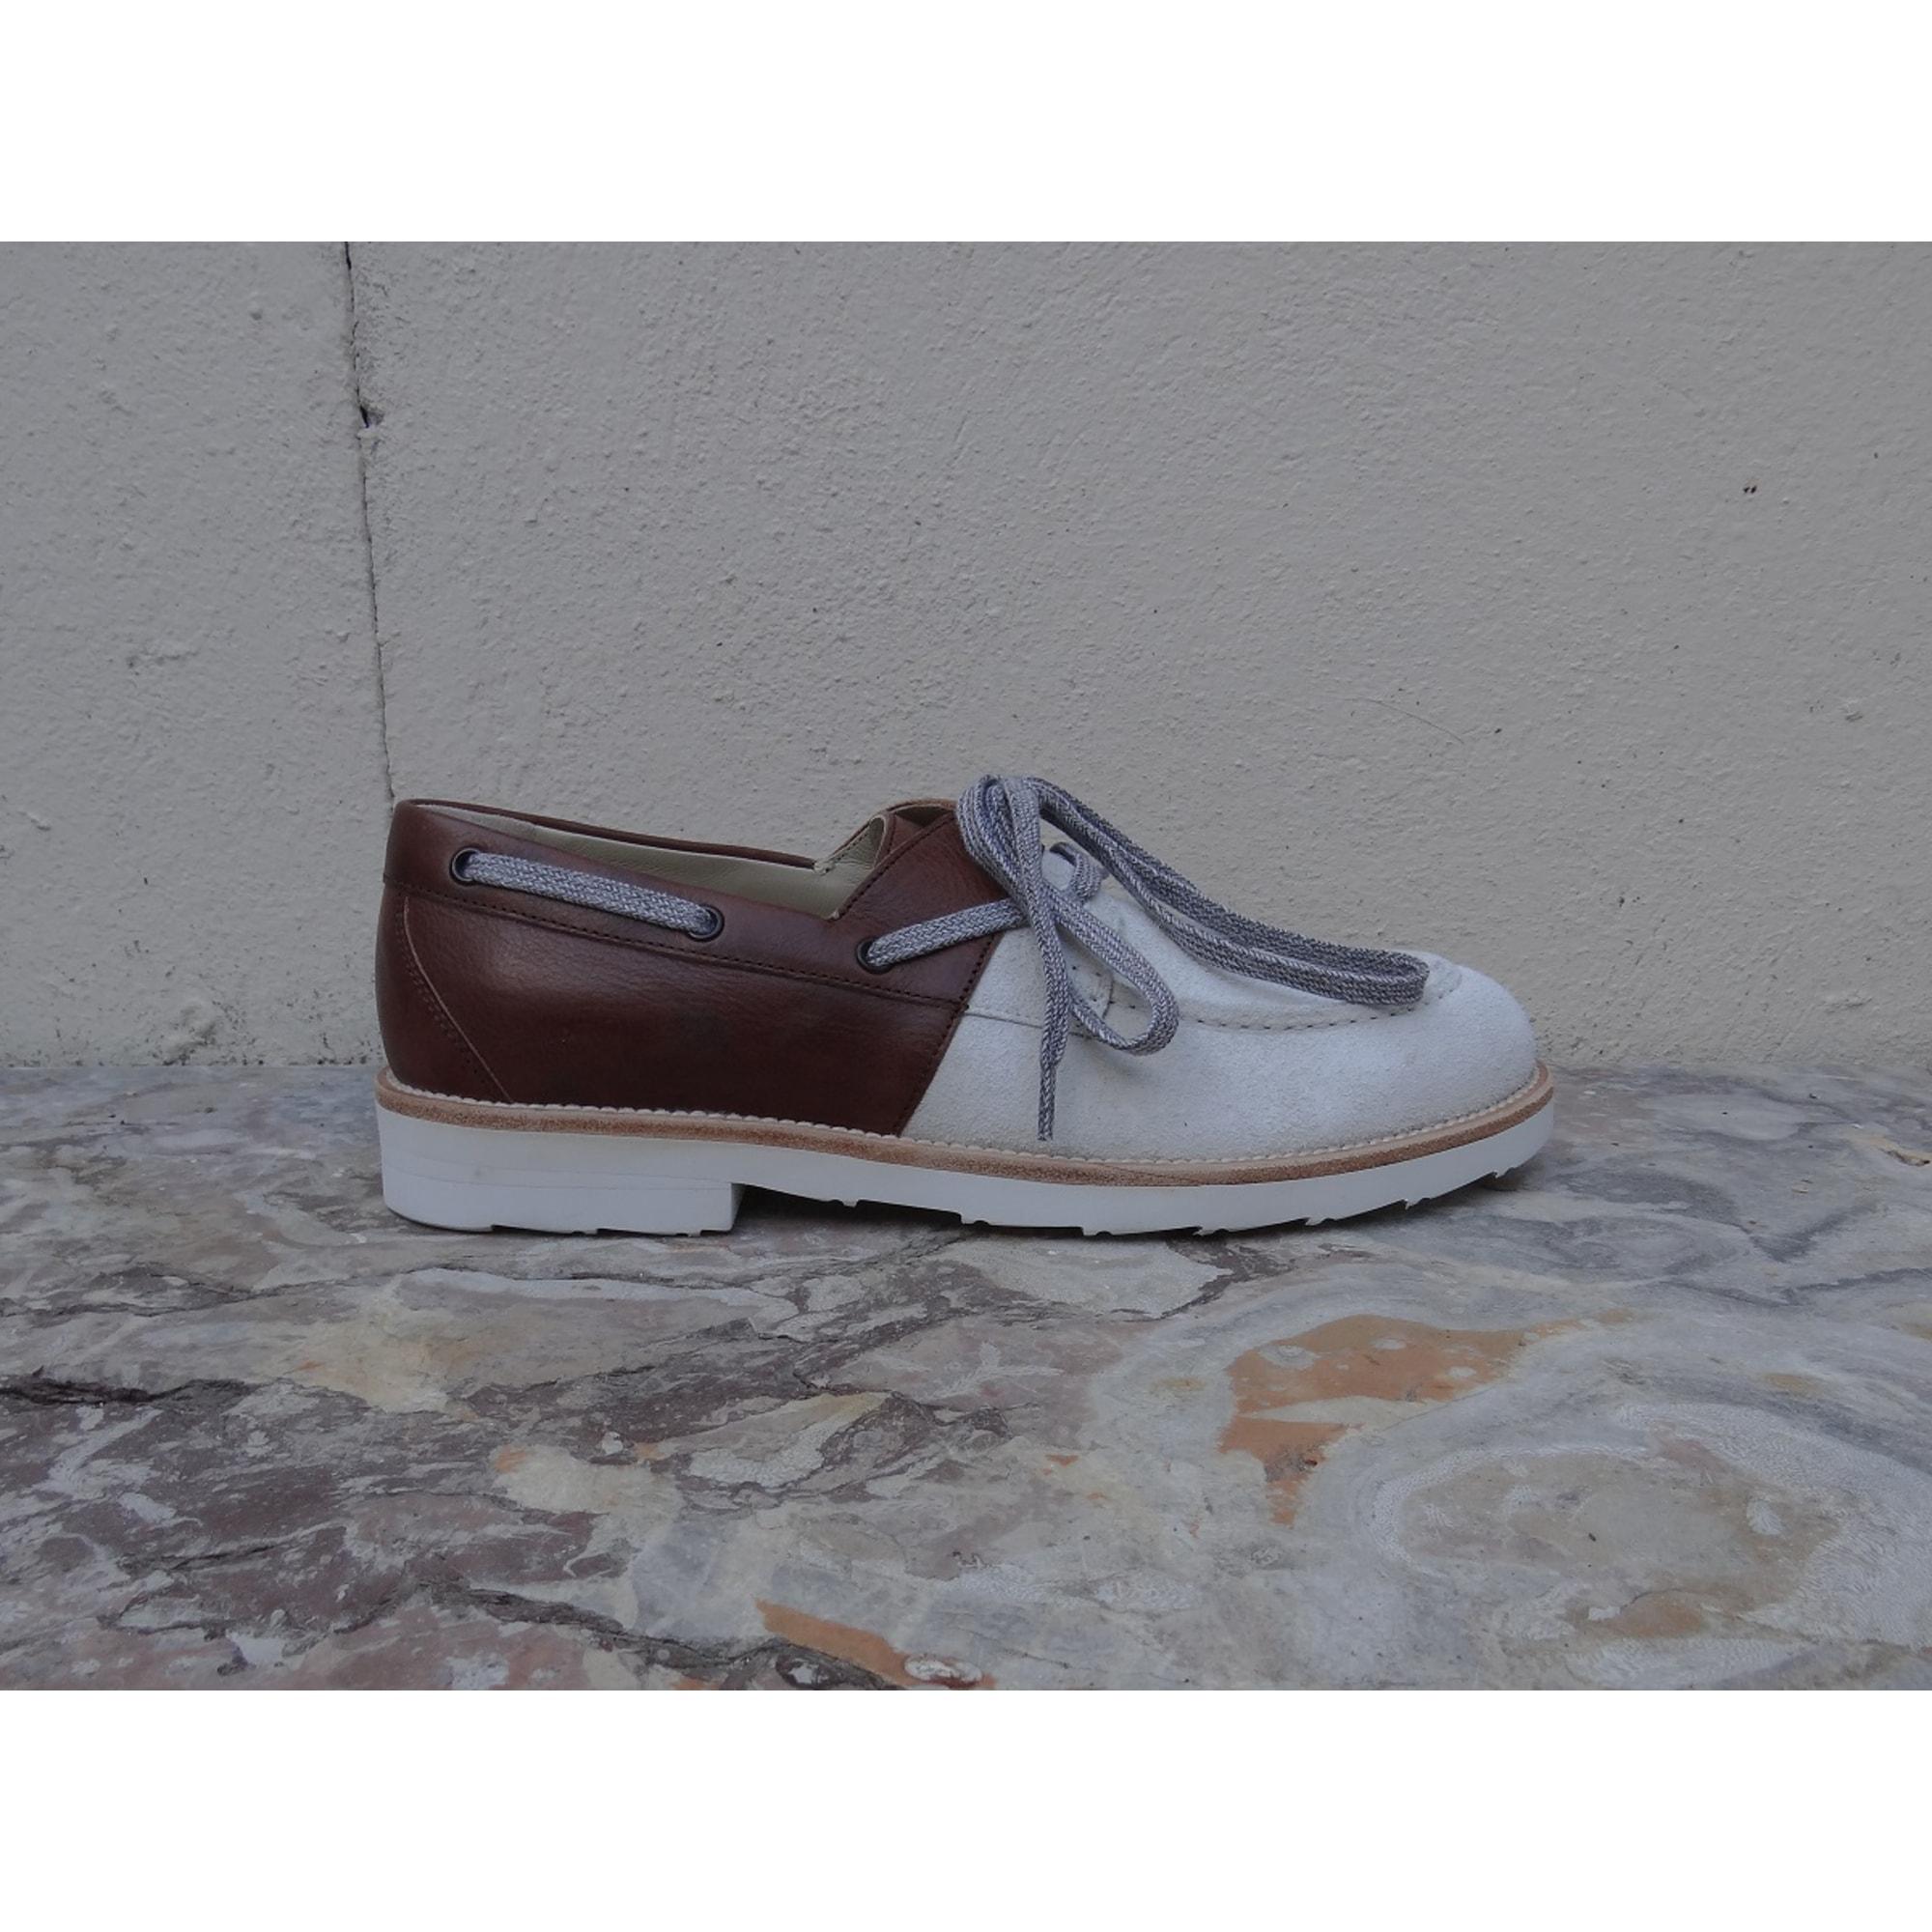 Lace Up Shoes DOLCE & GABBANA White, off-white, ecru